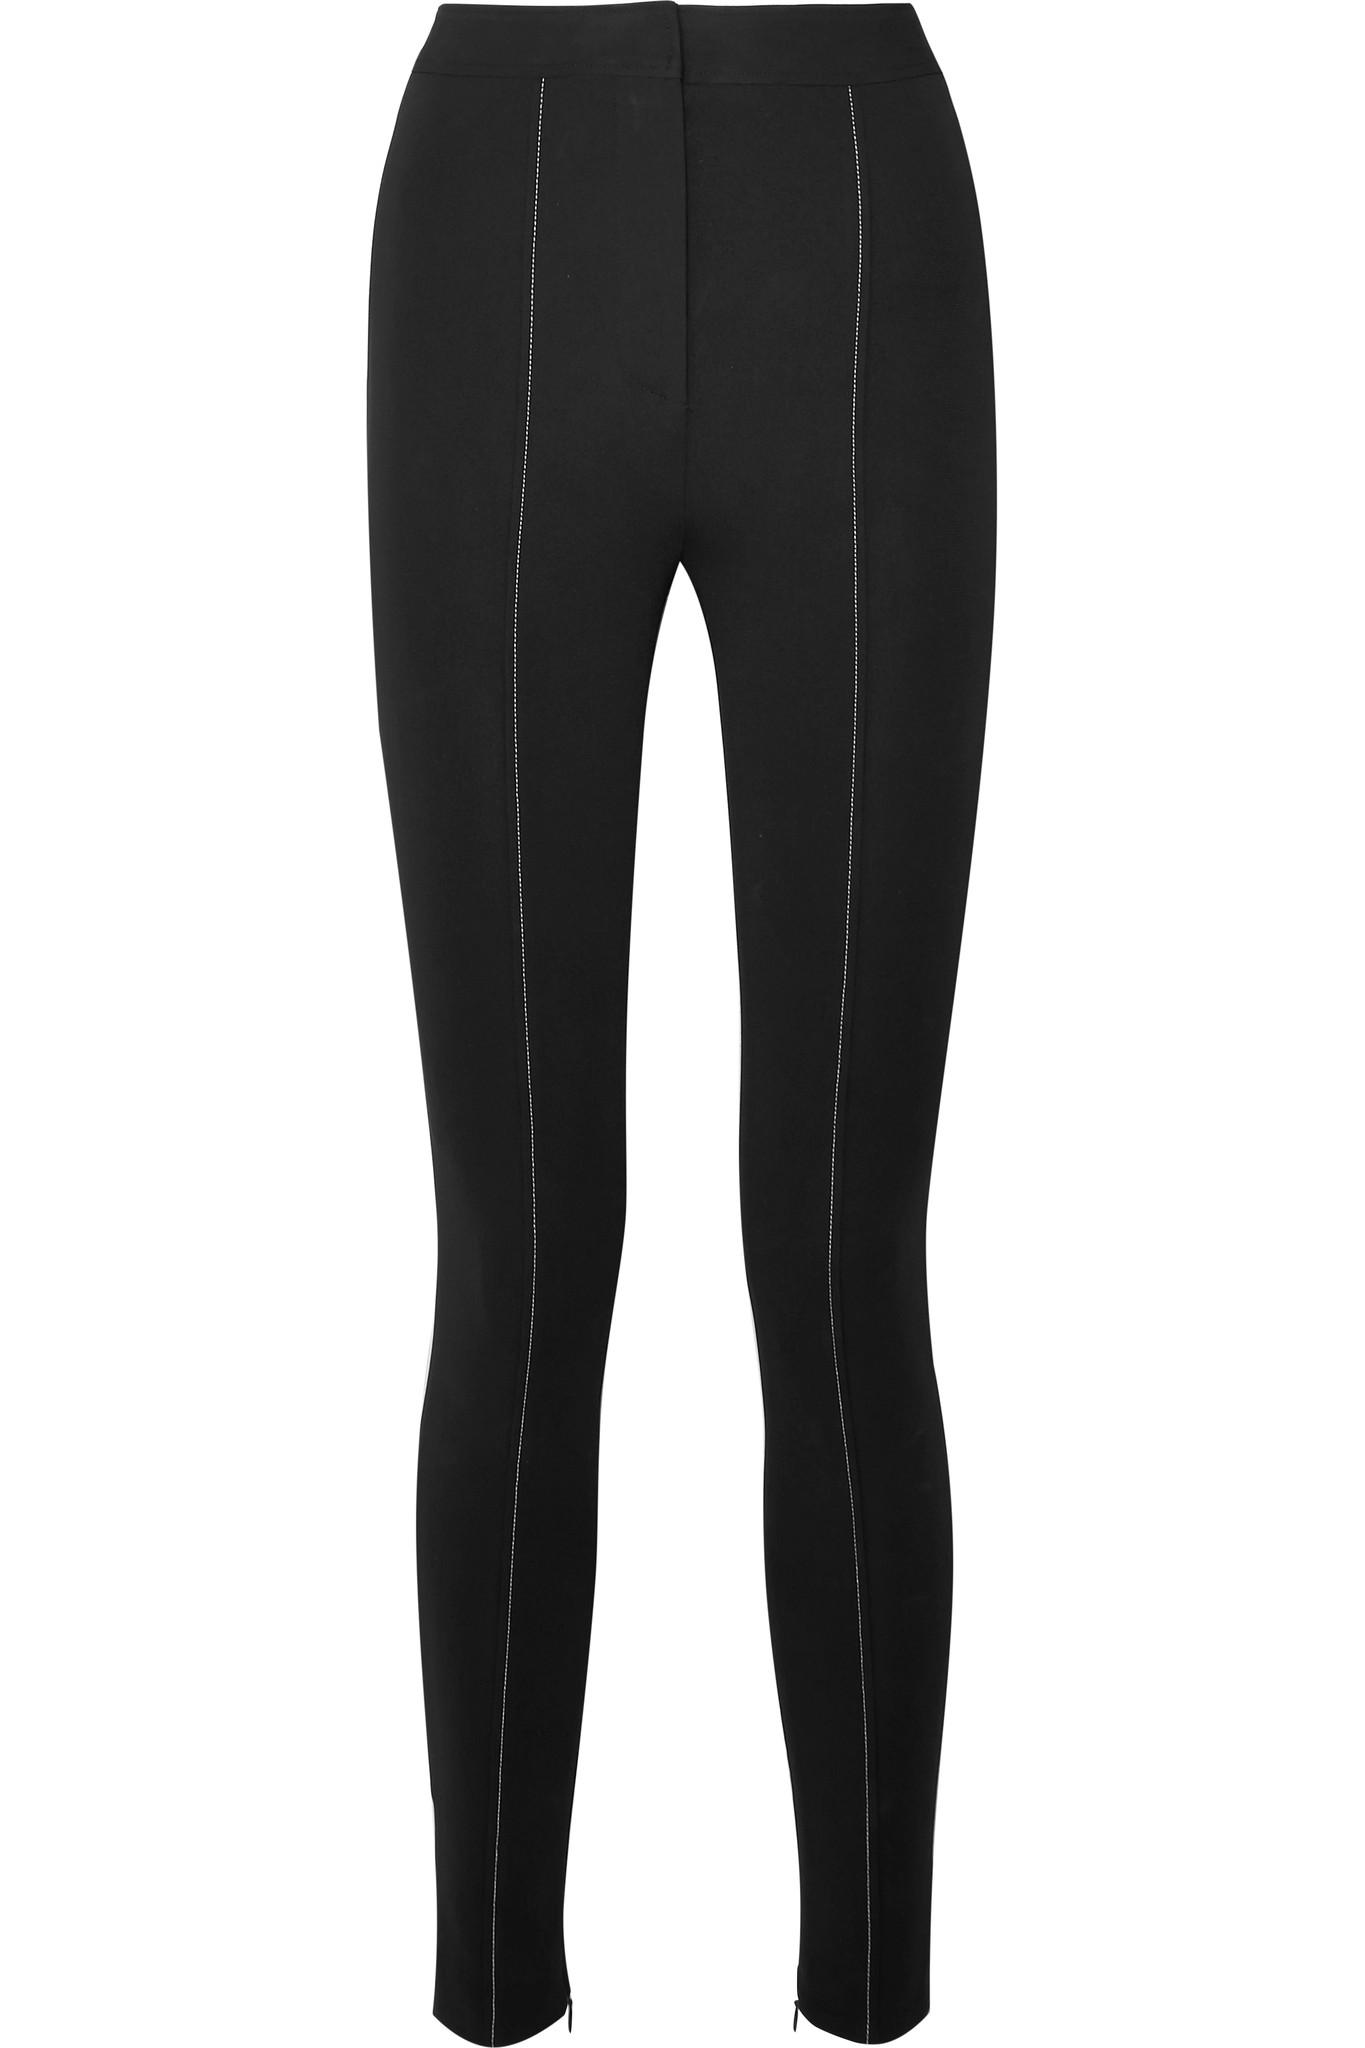 Mead Crepe Skinny Pants - Black Altuzarra Cheap Sale Latest Collections Good Selling TWTRwCR